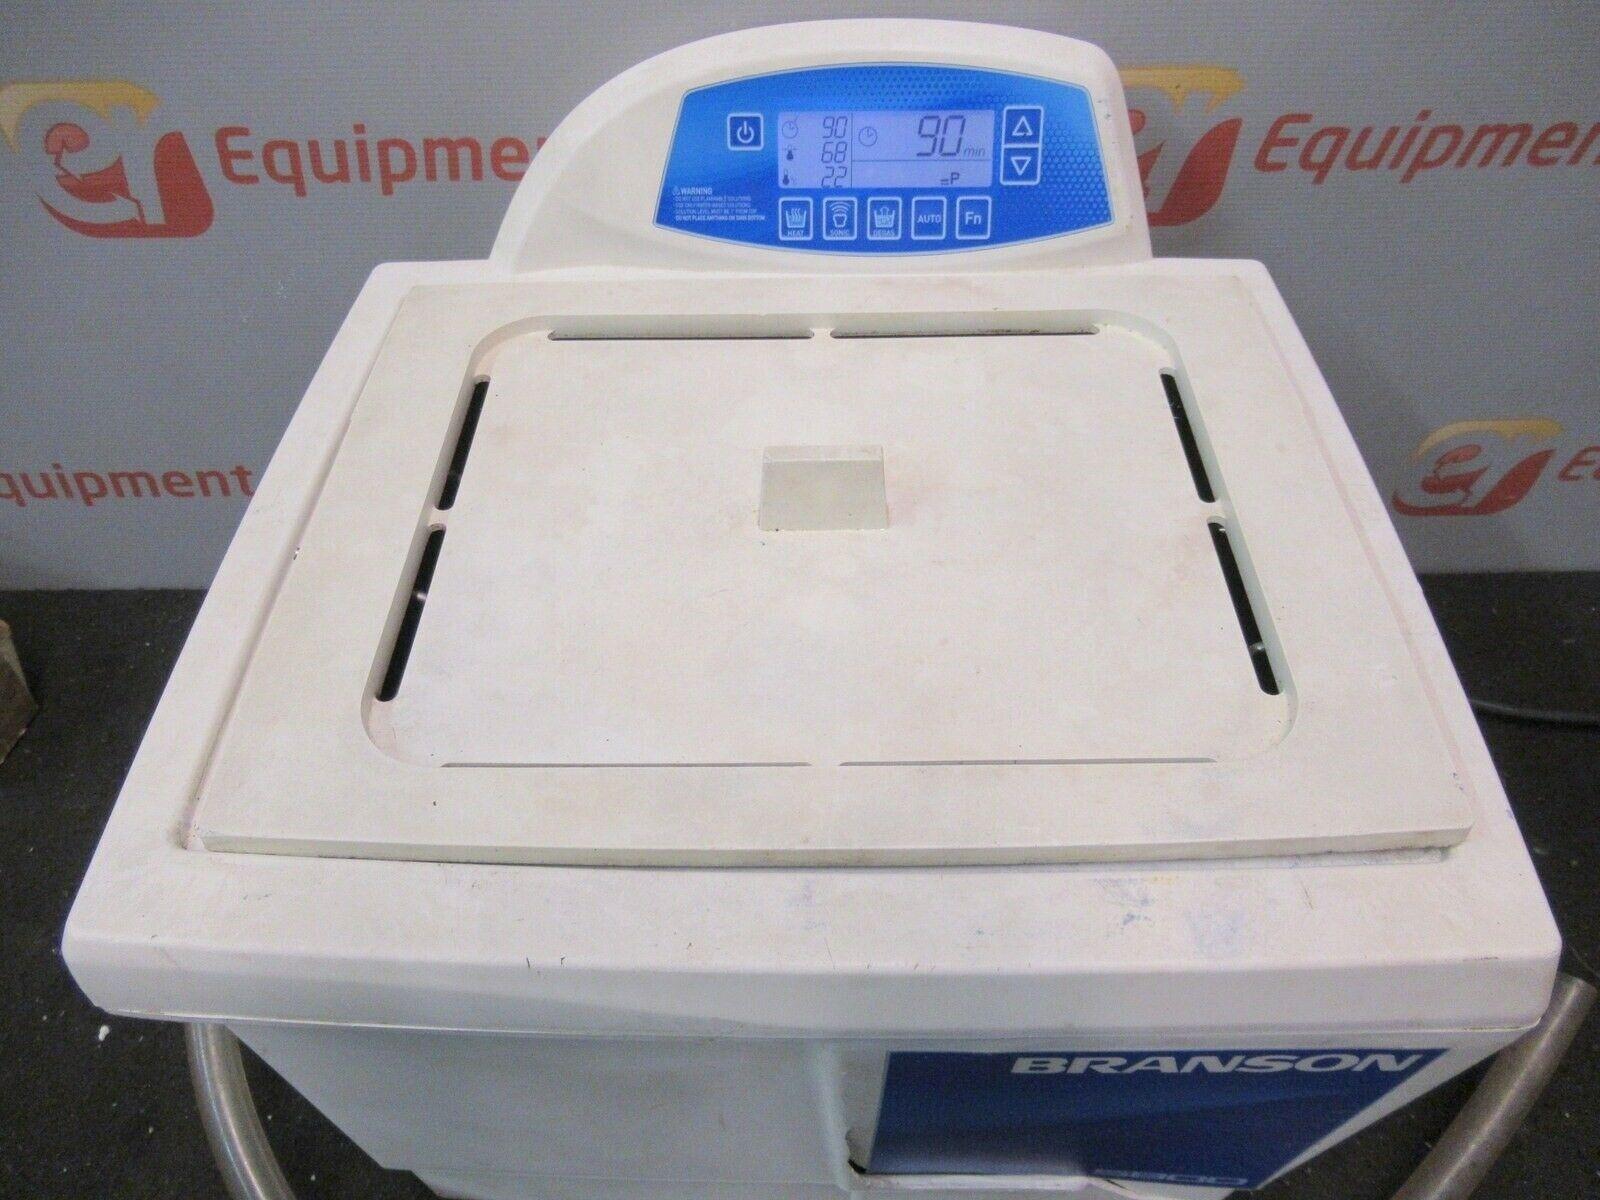 Branson CPX5800H Ultrasonic Cleaner Bath Heated Digital CPX-952-518R 2.5Gal 1